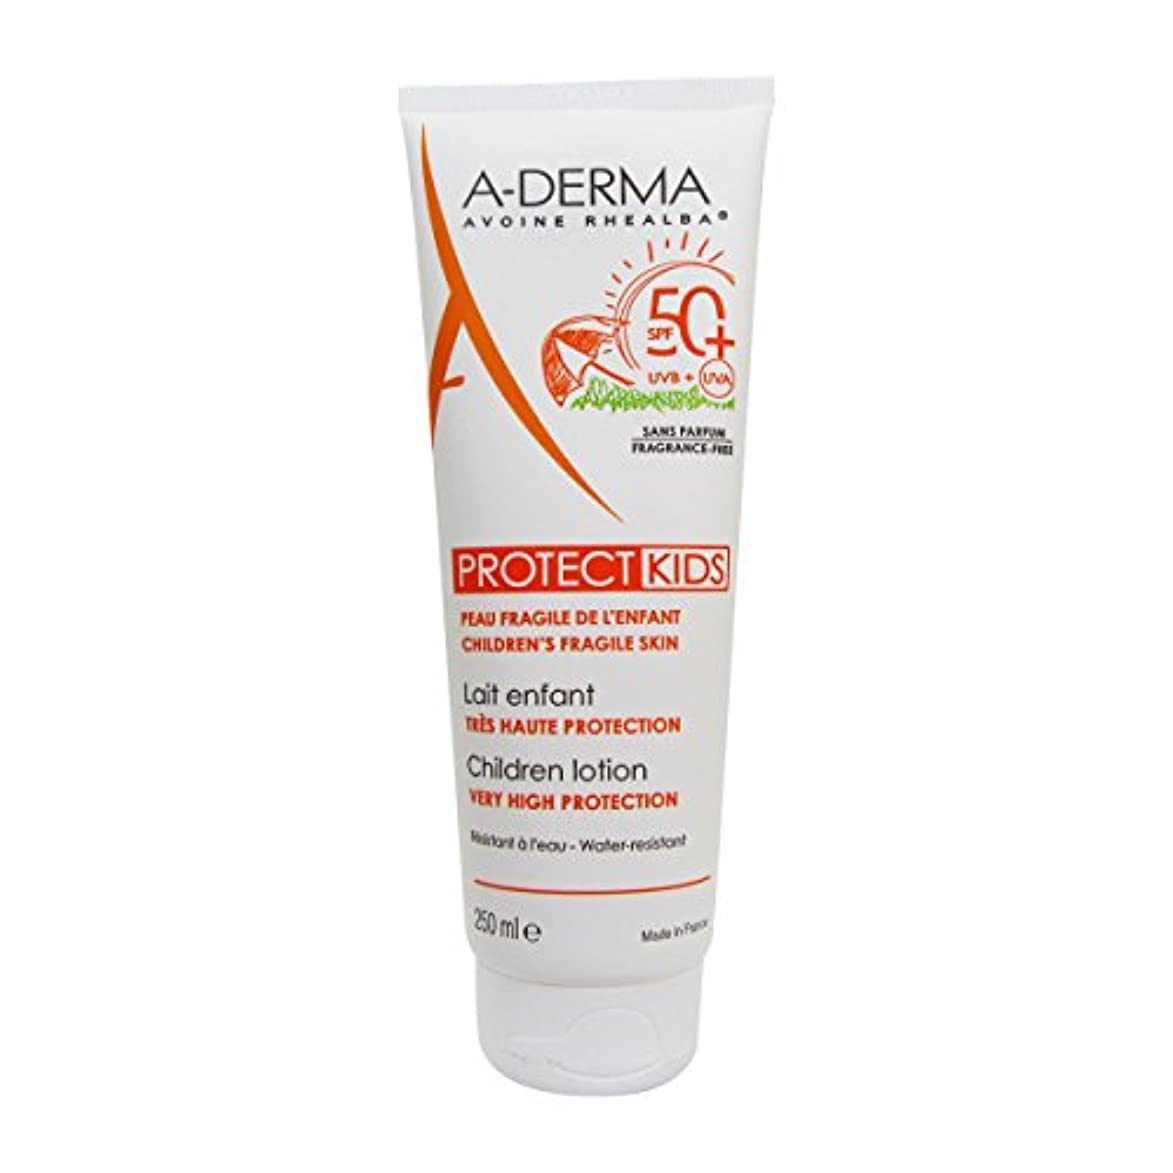 A-derma Protect Kids Lotion Spf50+ 200ml [並行輸入品]